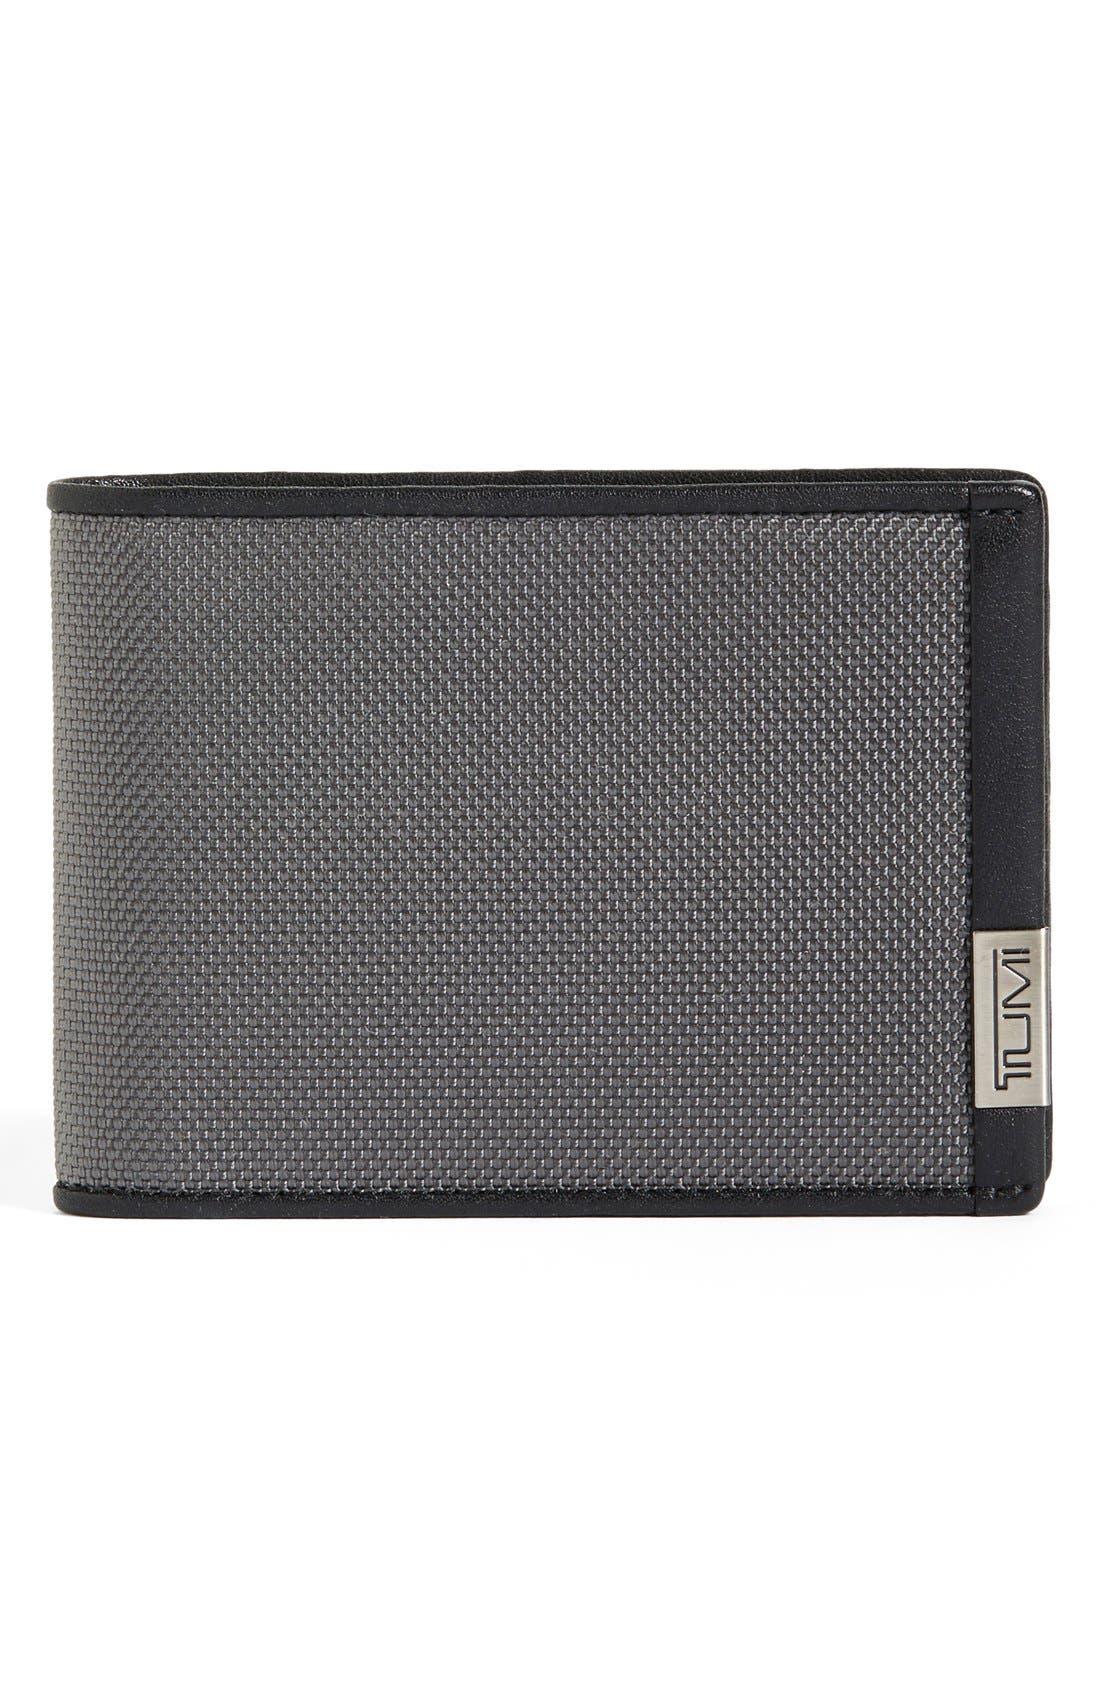 Alpha Ballistic Nylon Wallet,                             Main thumbnail 1, color,                             034